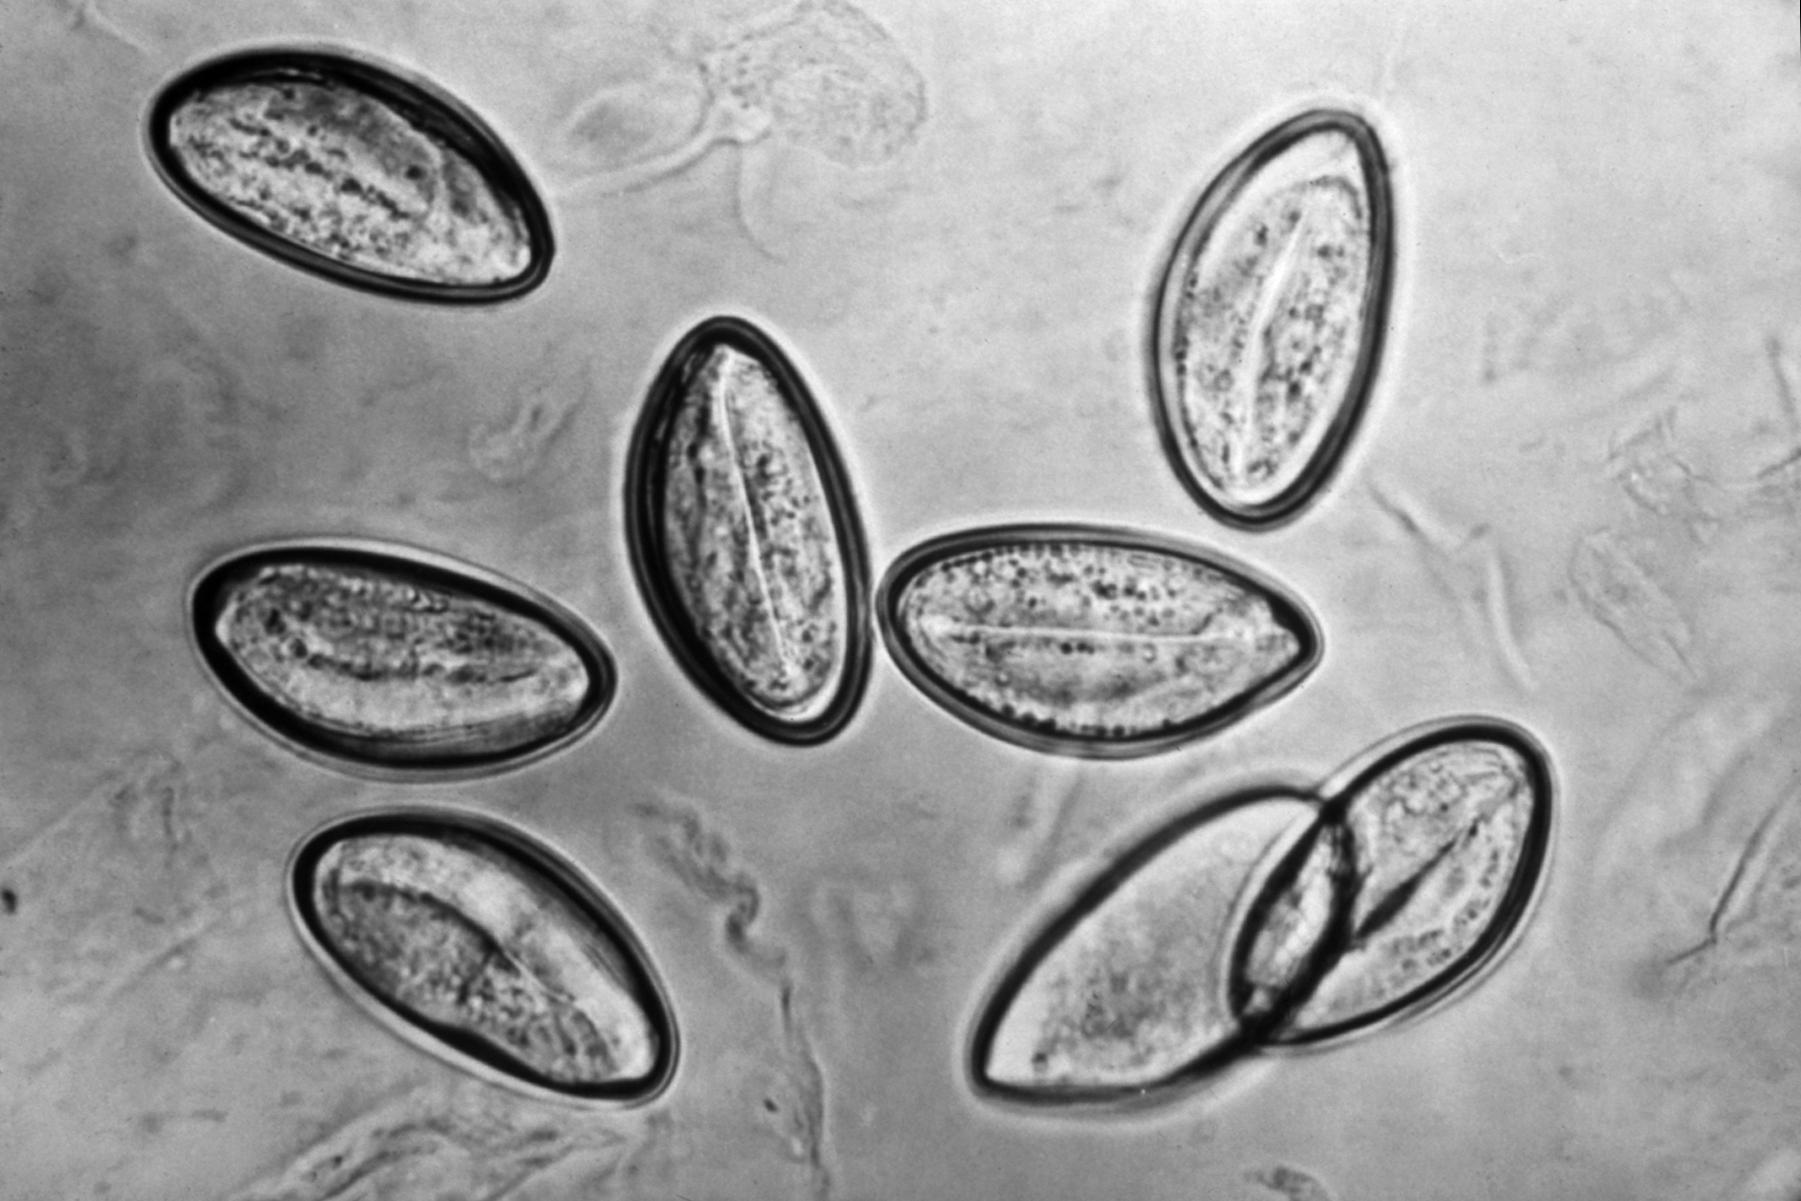 enterobius vermicularis signs and symptoms)